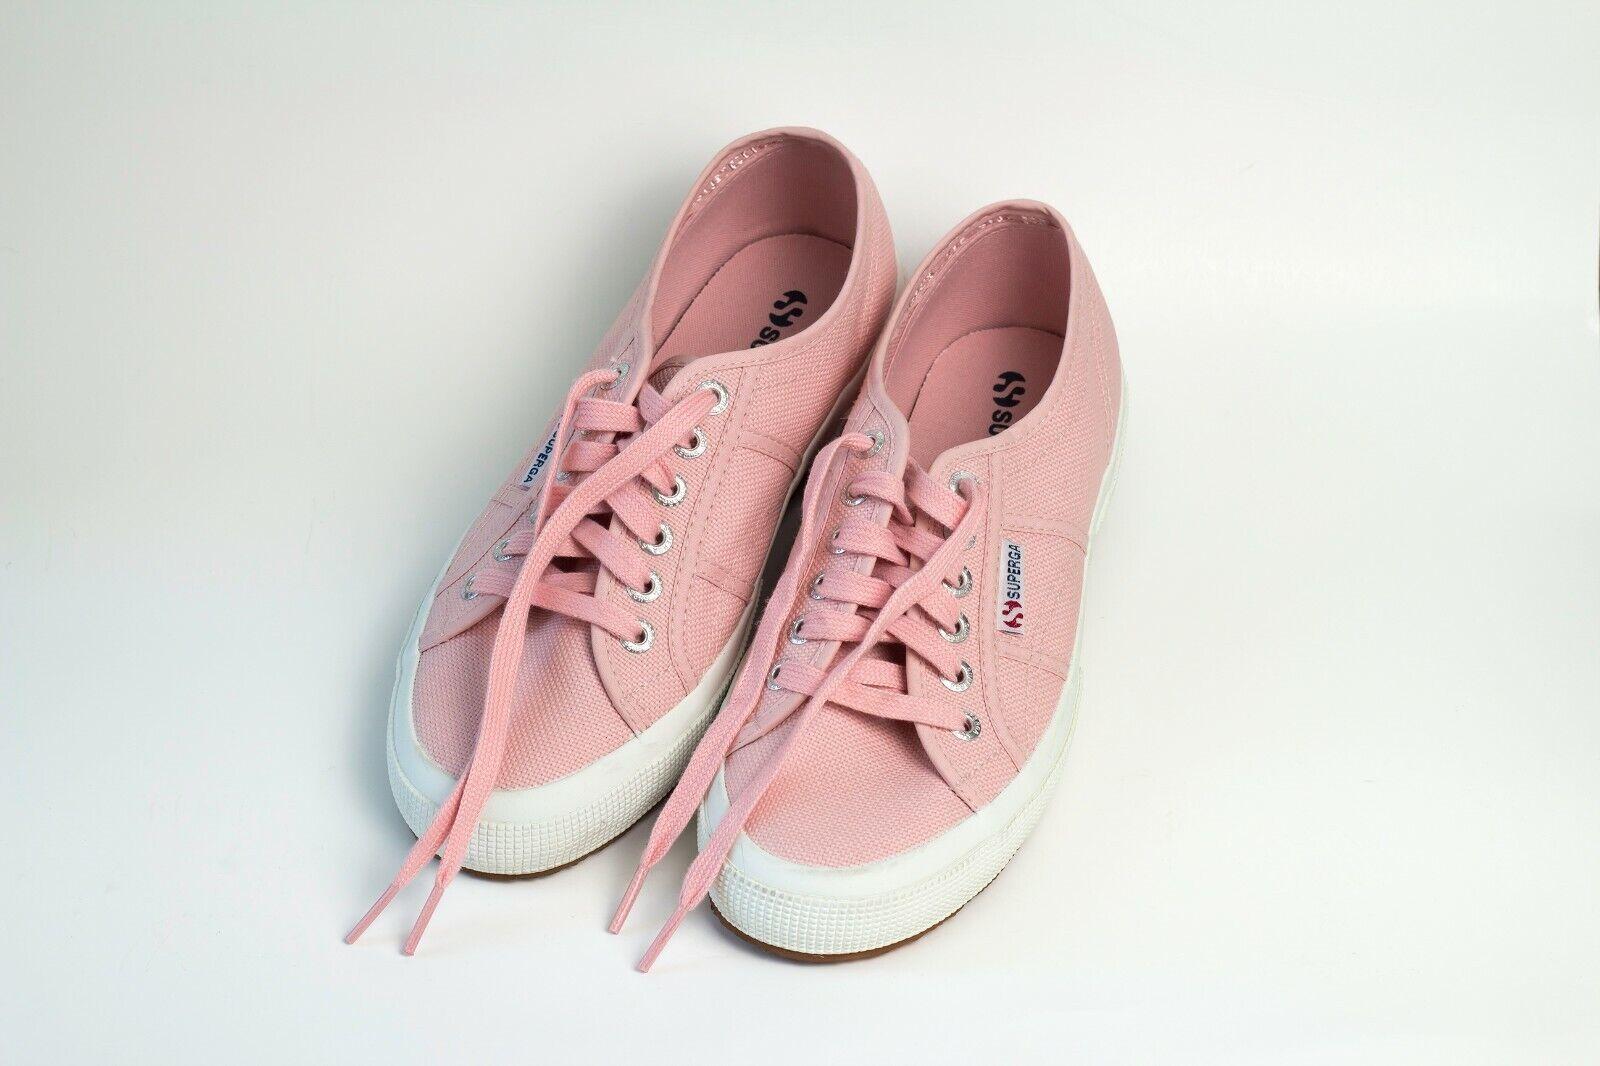 Superga Cotu Classic Classic Classic Womens US Size 8 - pink Mahogany 9ee412